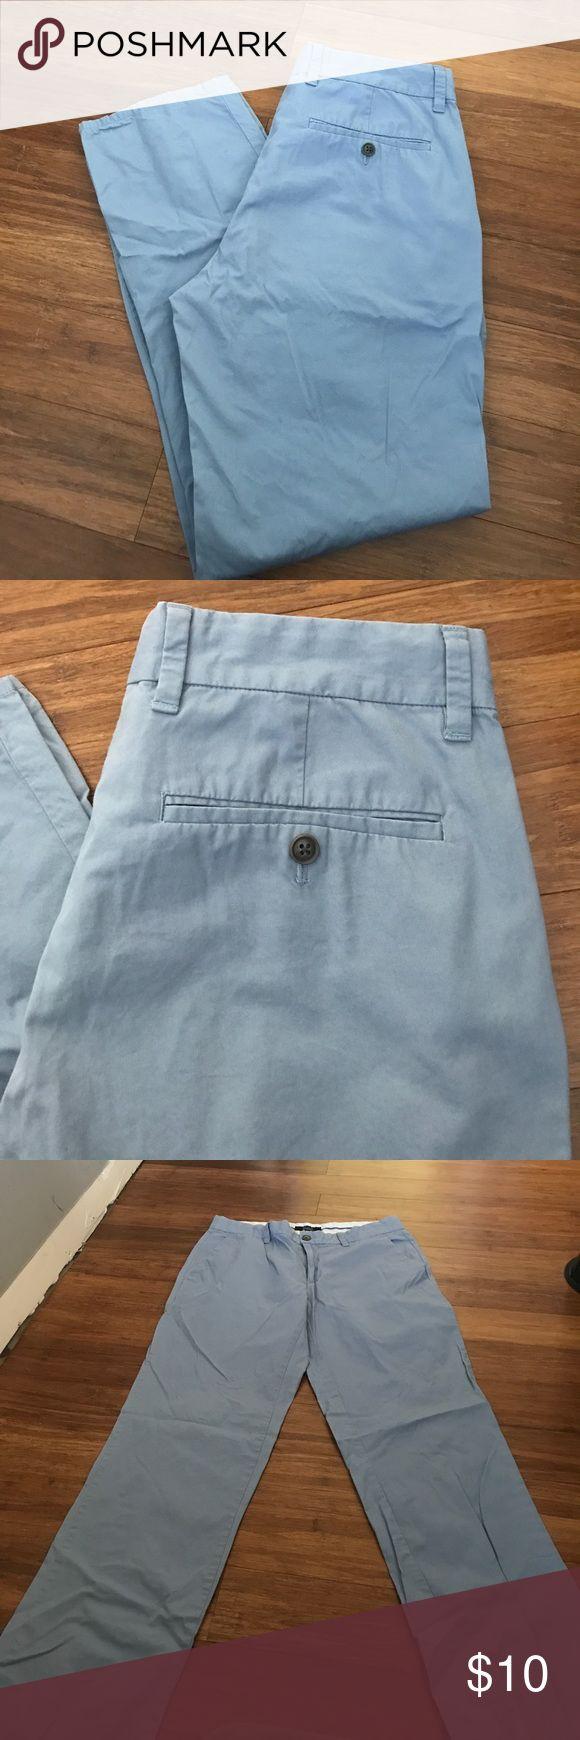 Men's Khaki pants Black Saks fifth Avenue slacks. Good Condition. Light blue color BLACK Saks Fifth Avenue Pants Chinos & Khakis